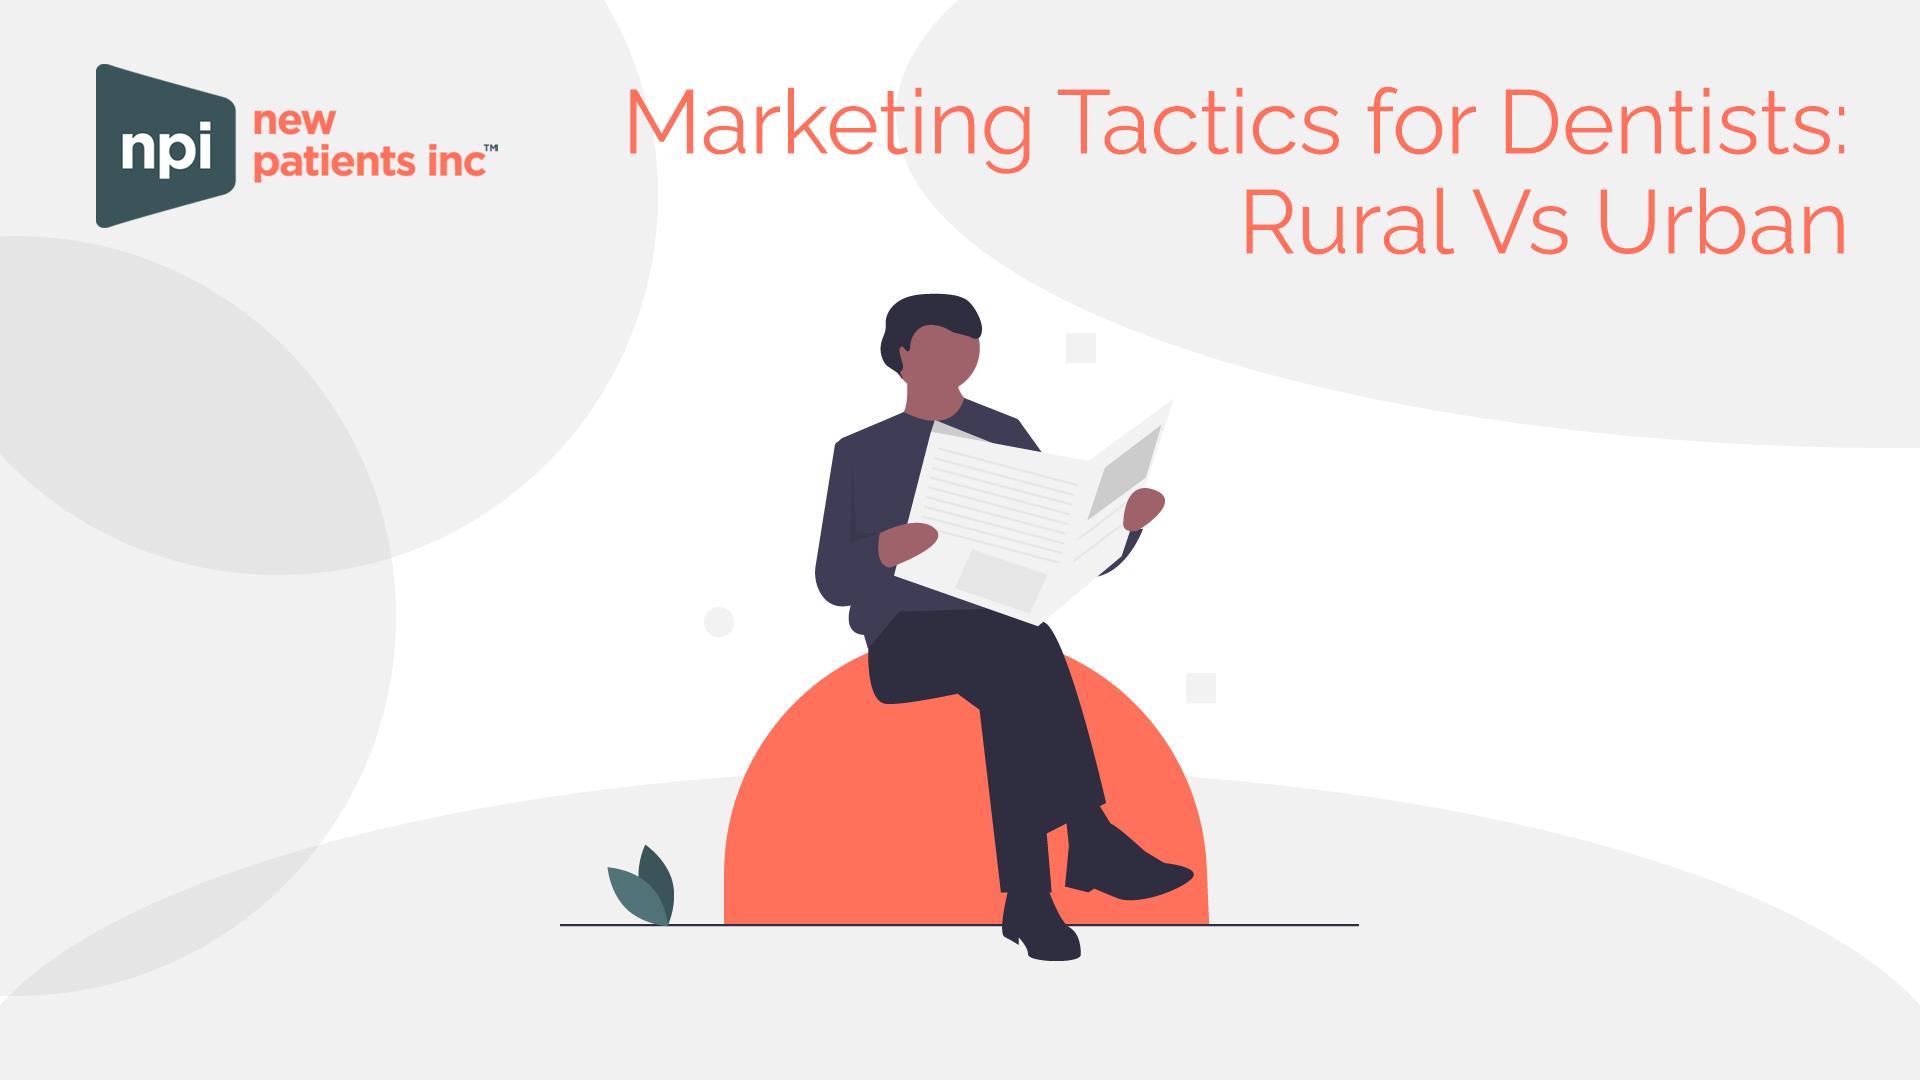 Rural Vs Urban Dental Marketing